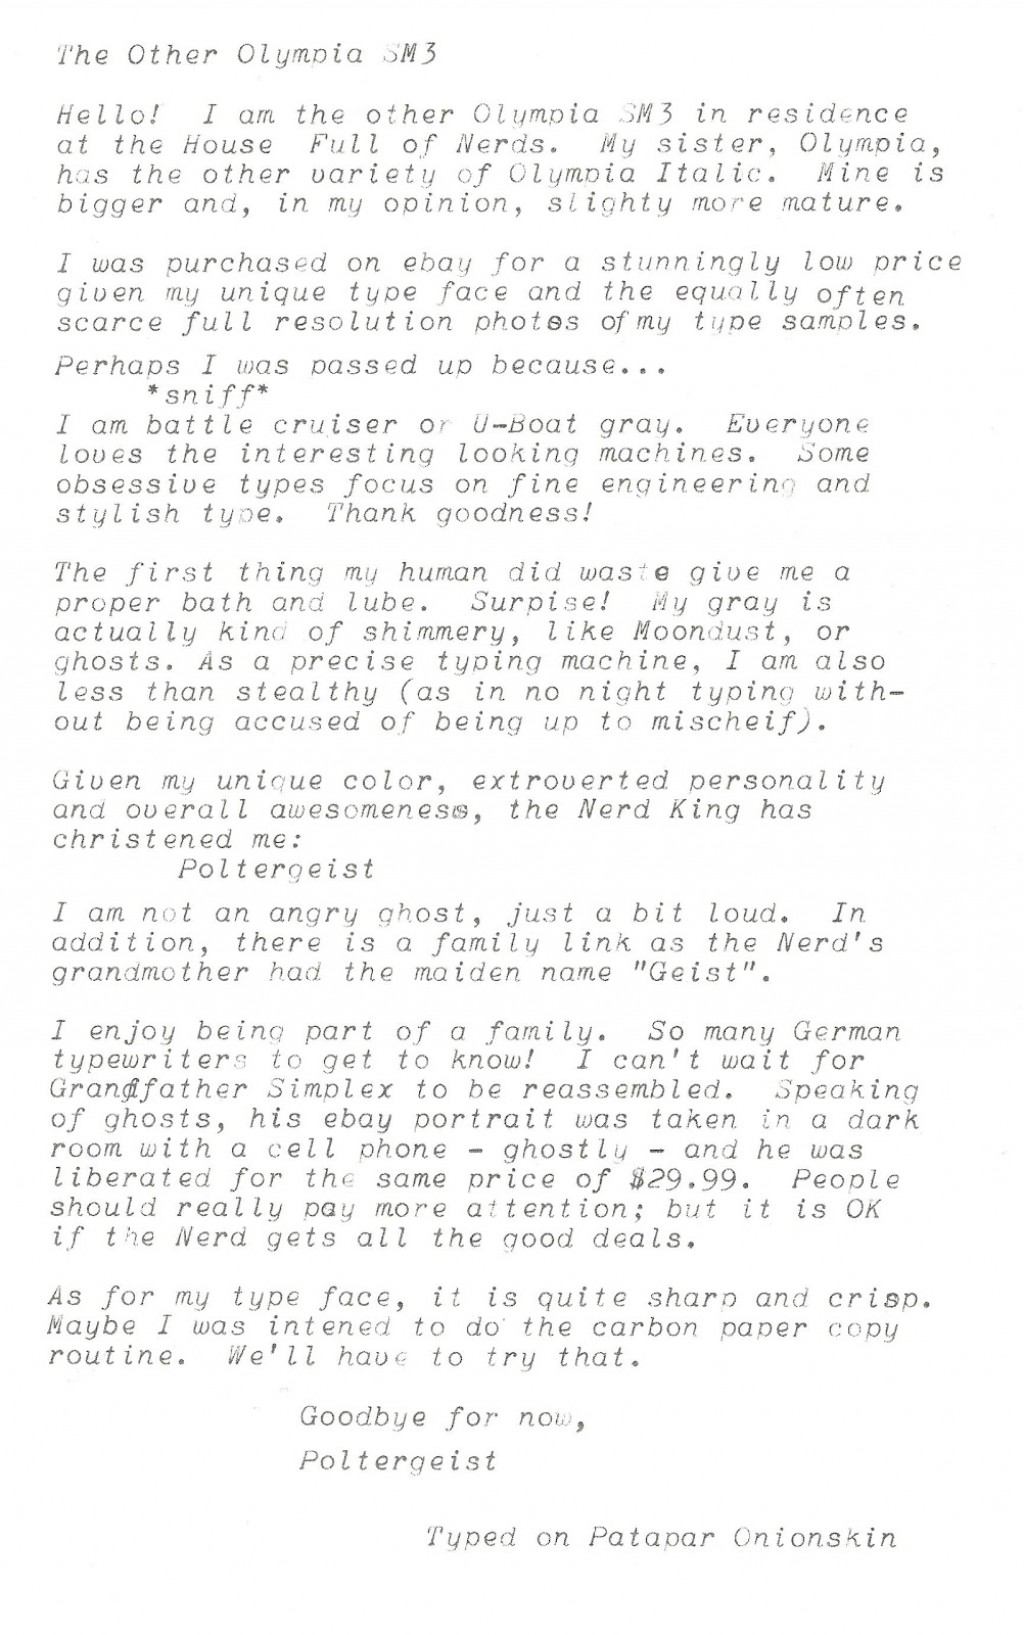 023 Fix My Essay Example Olympiasm3poltergeistintroduction11 Singular Generator Free Title Online Large